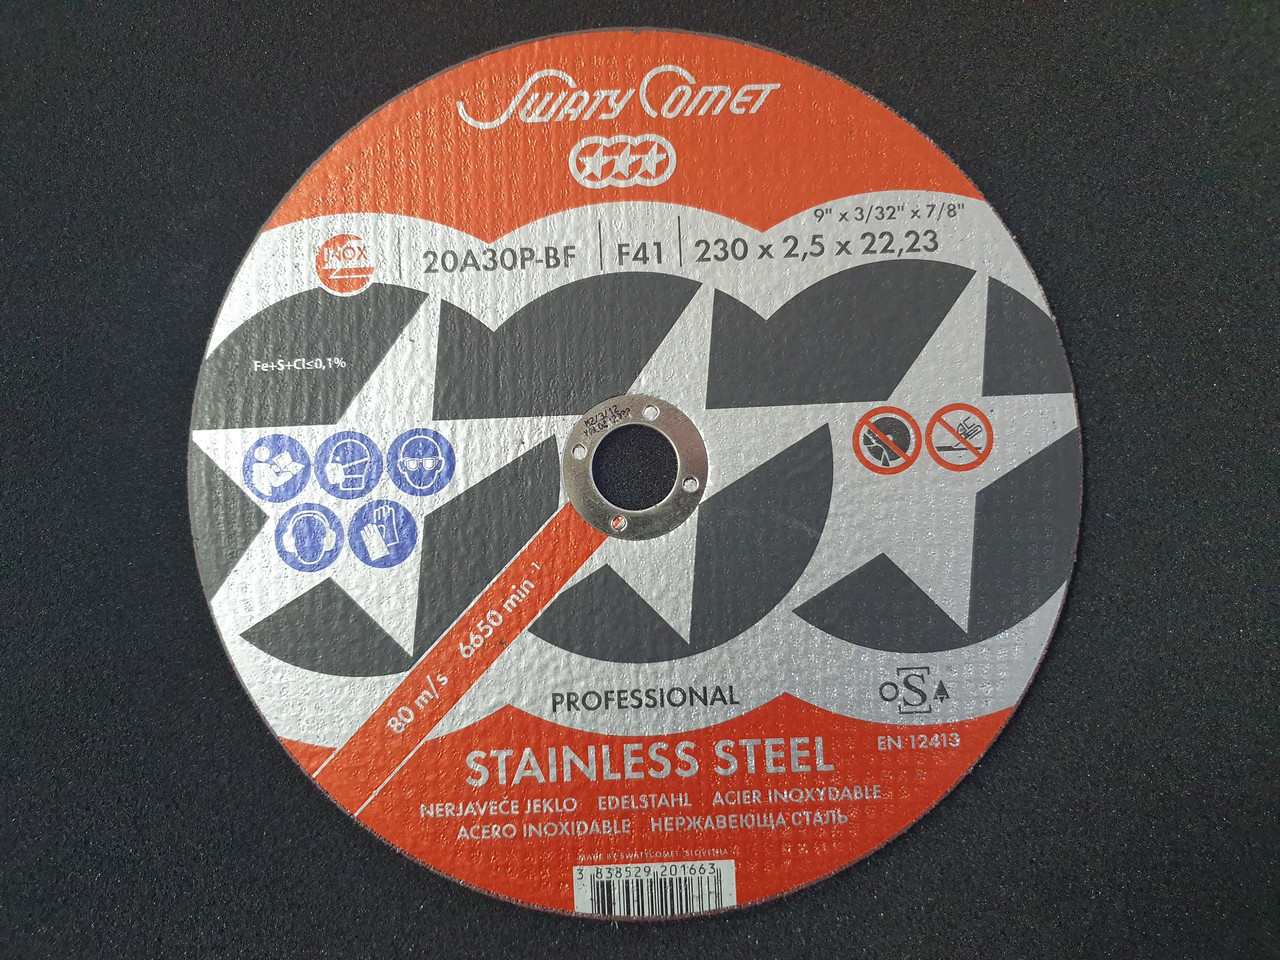 Круг отрезной Inox&Metal 230 х 2,5 х 22,23 SwatyComet 20A30P-BF (Weiler Abrasives, Slovenija)